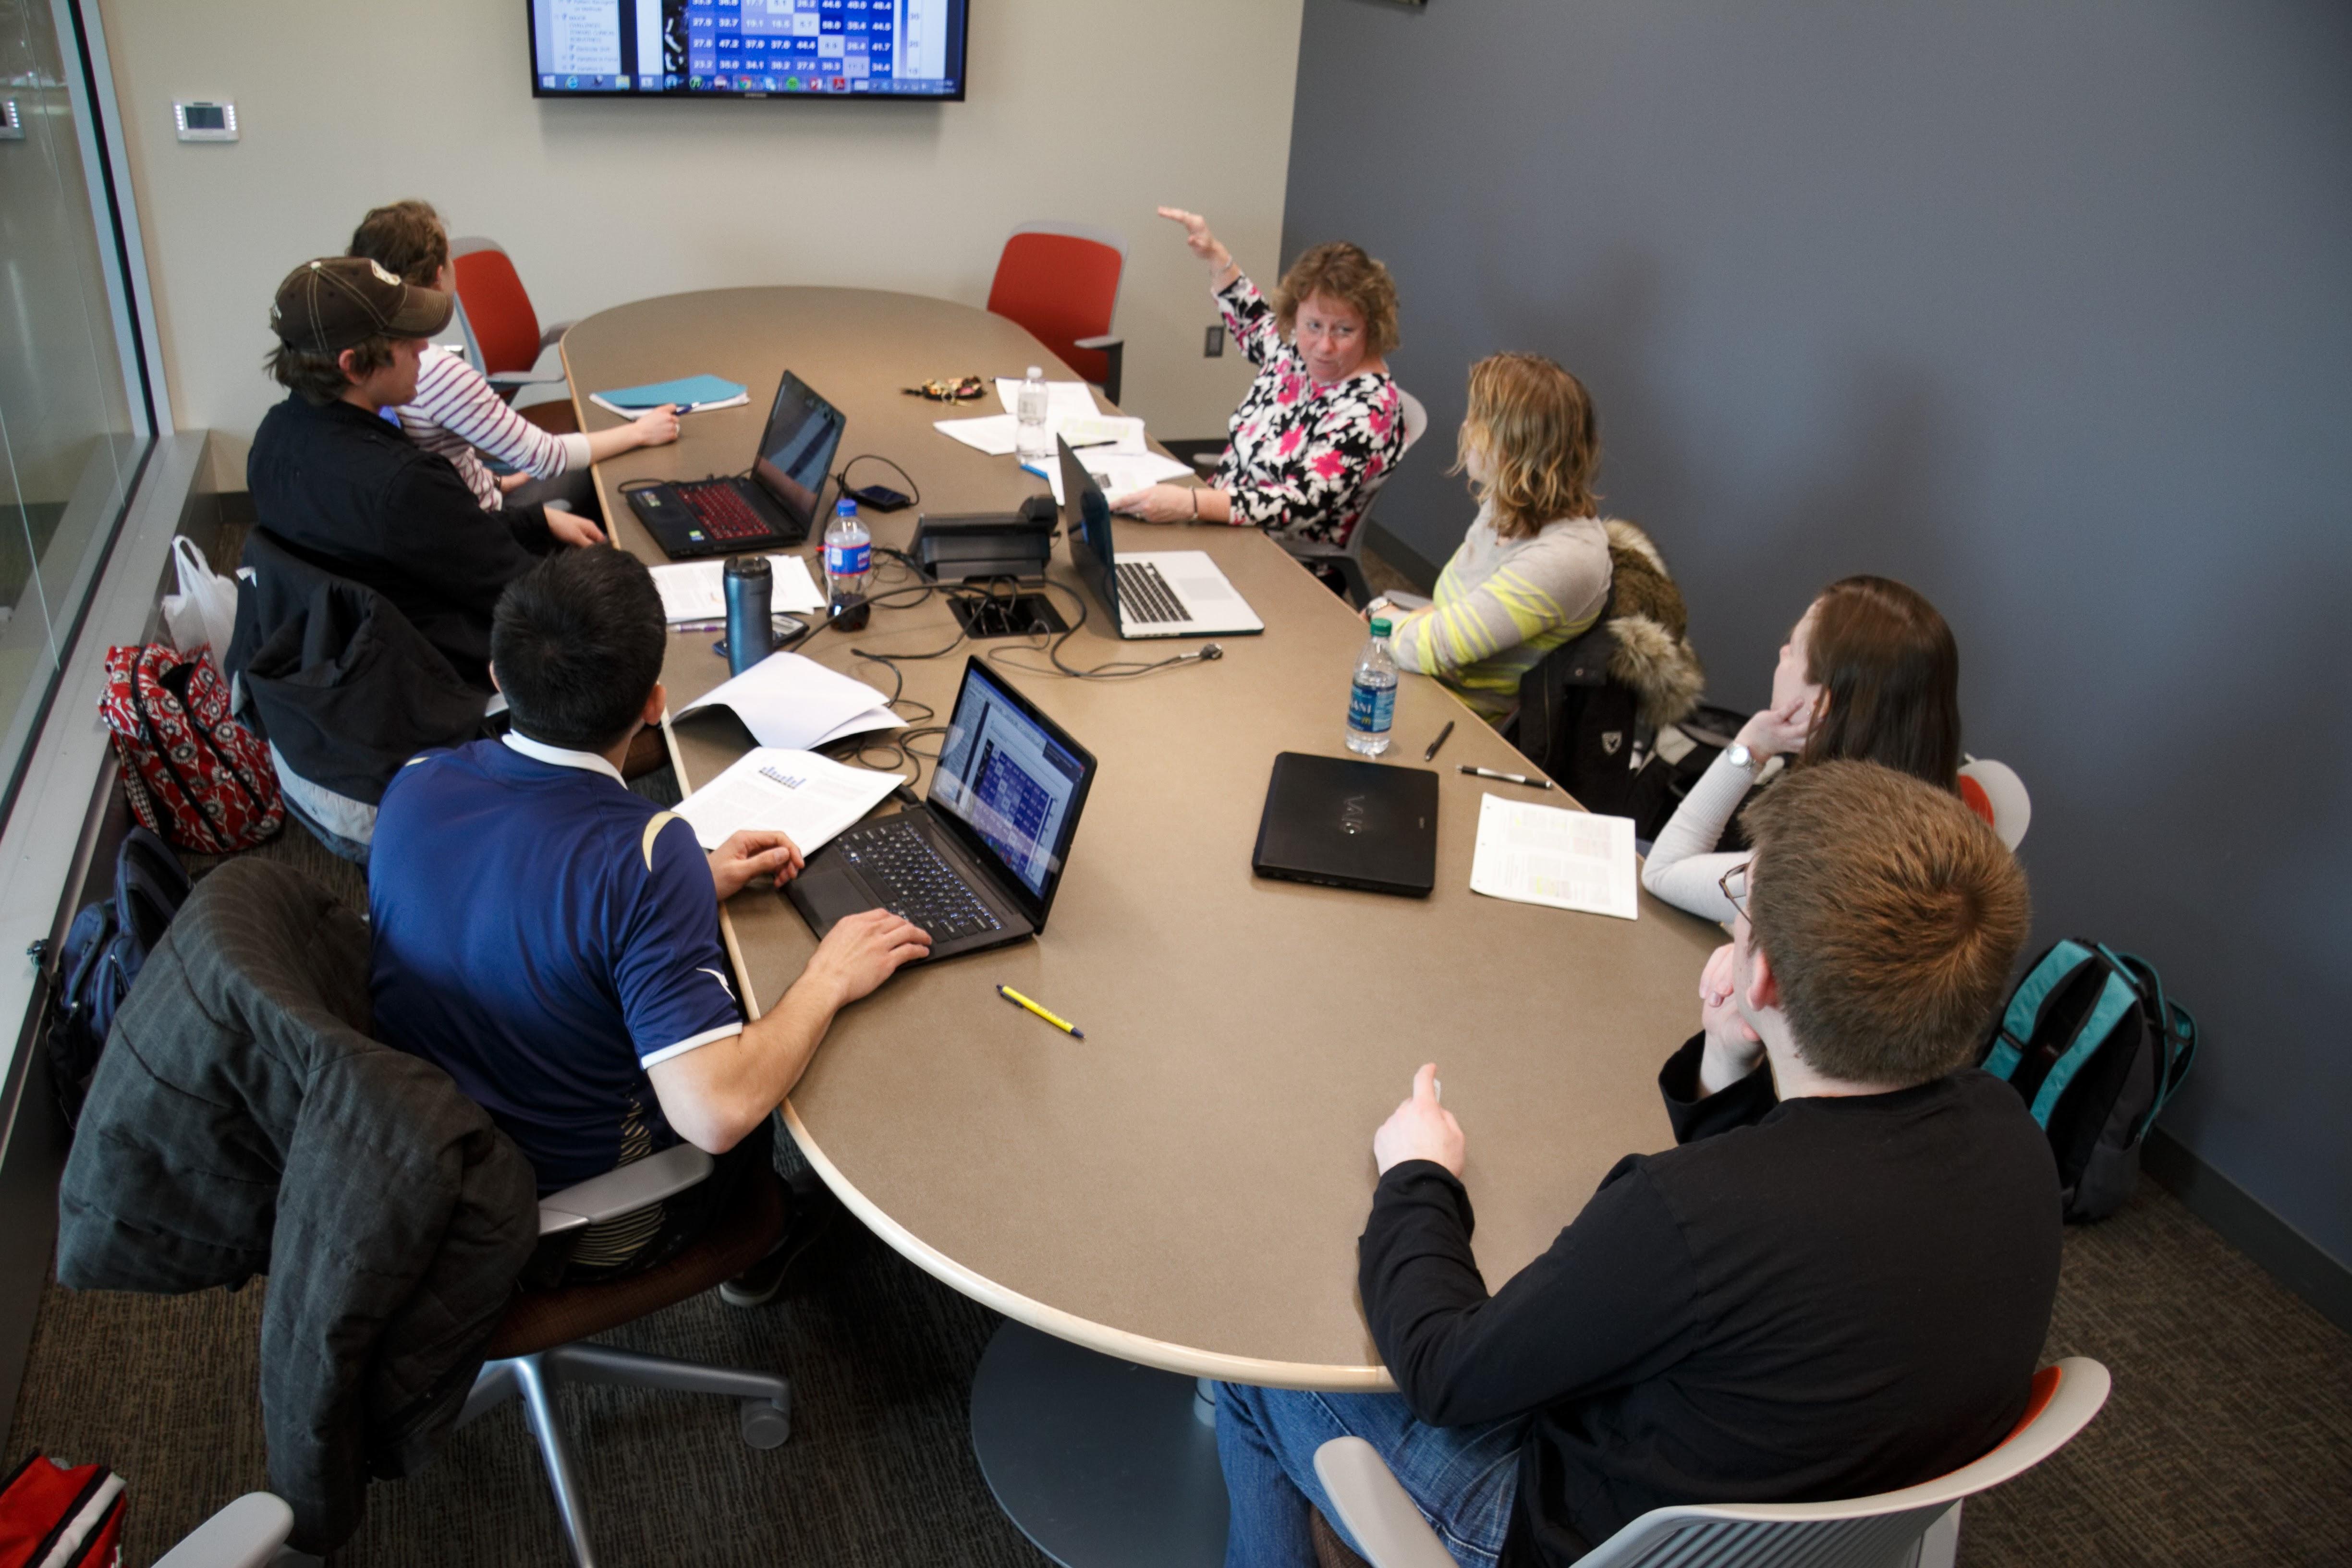 Facilitating an online course (An online 7 week faculty seminar, 1/14 - 3/3)